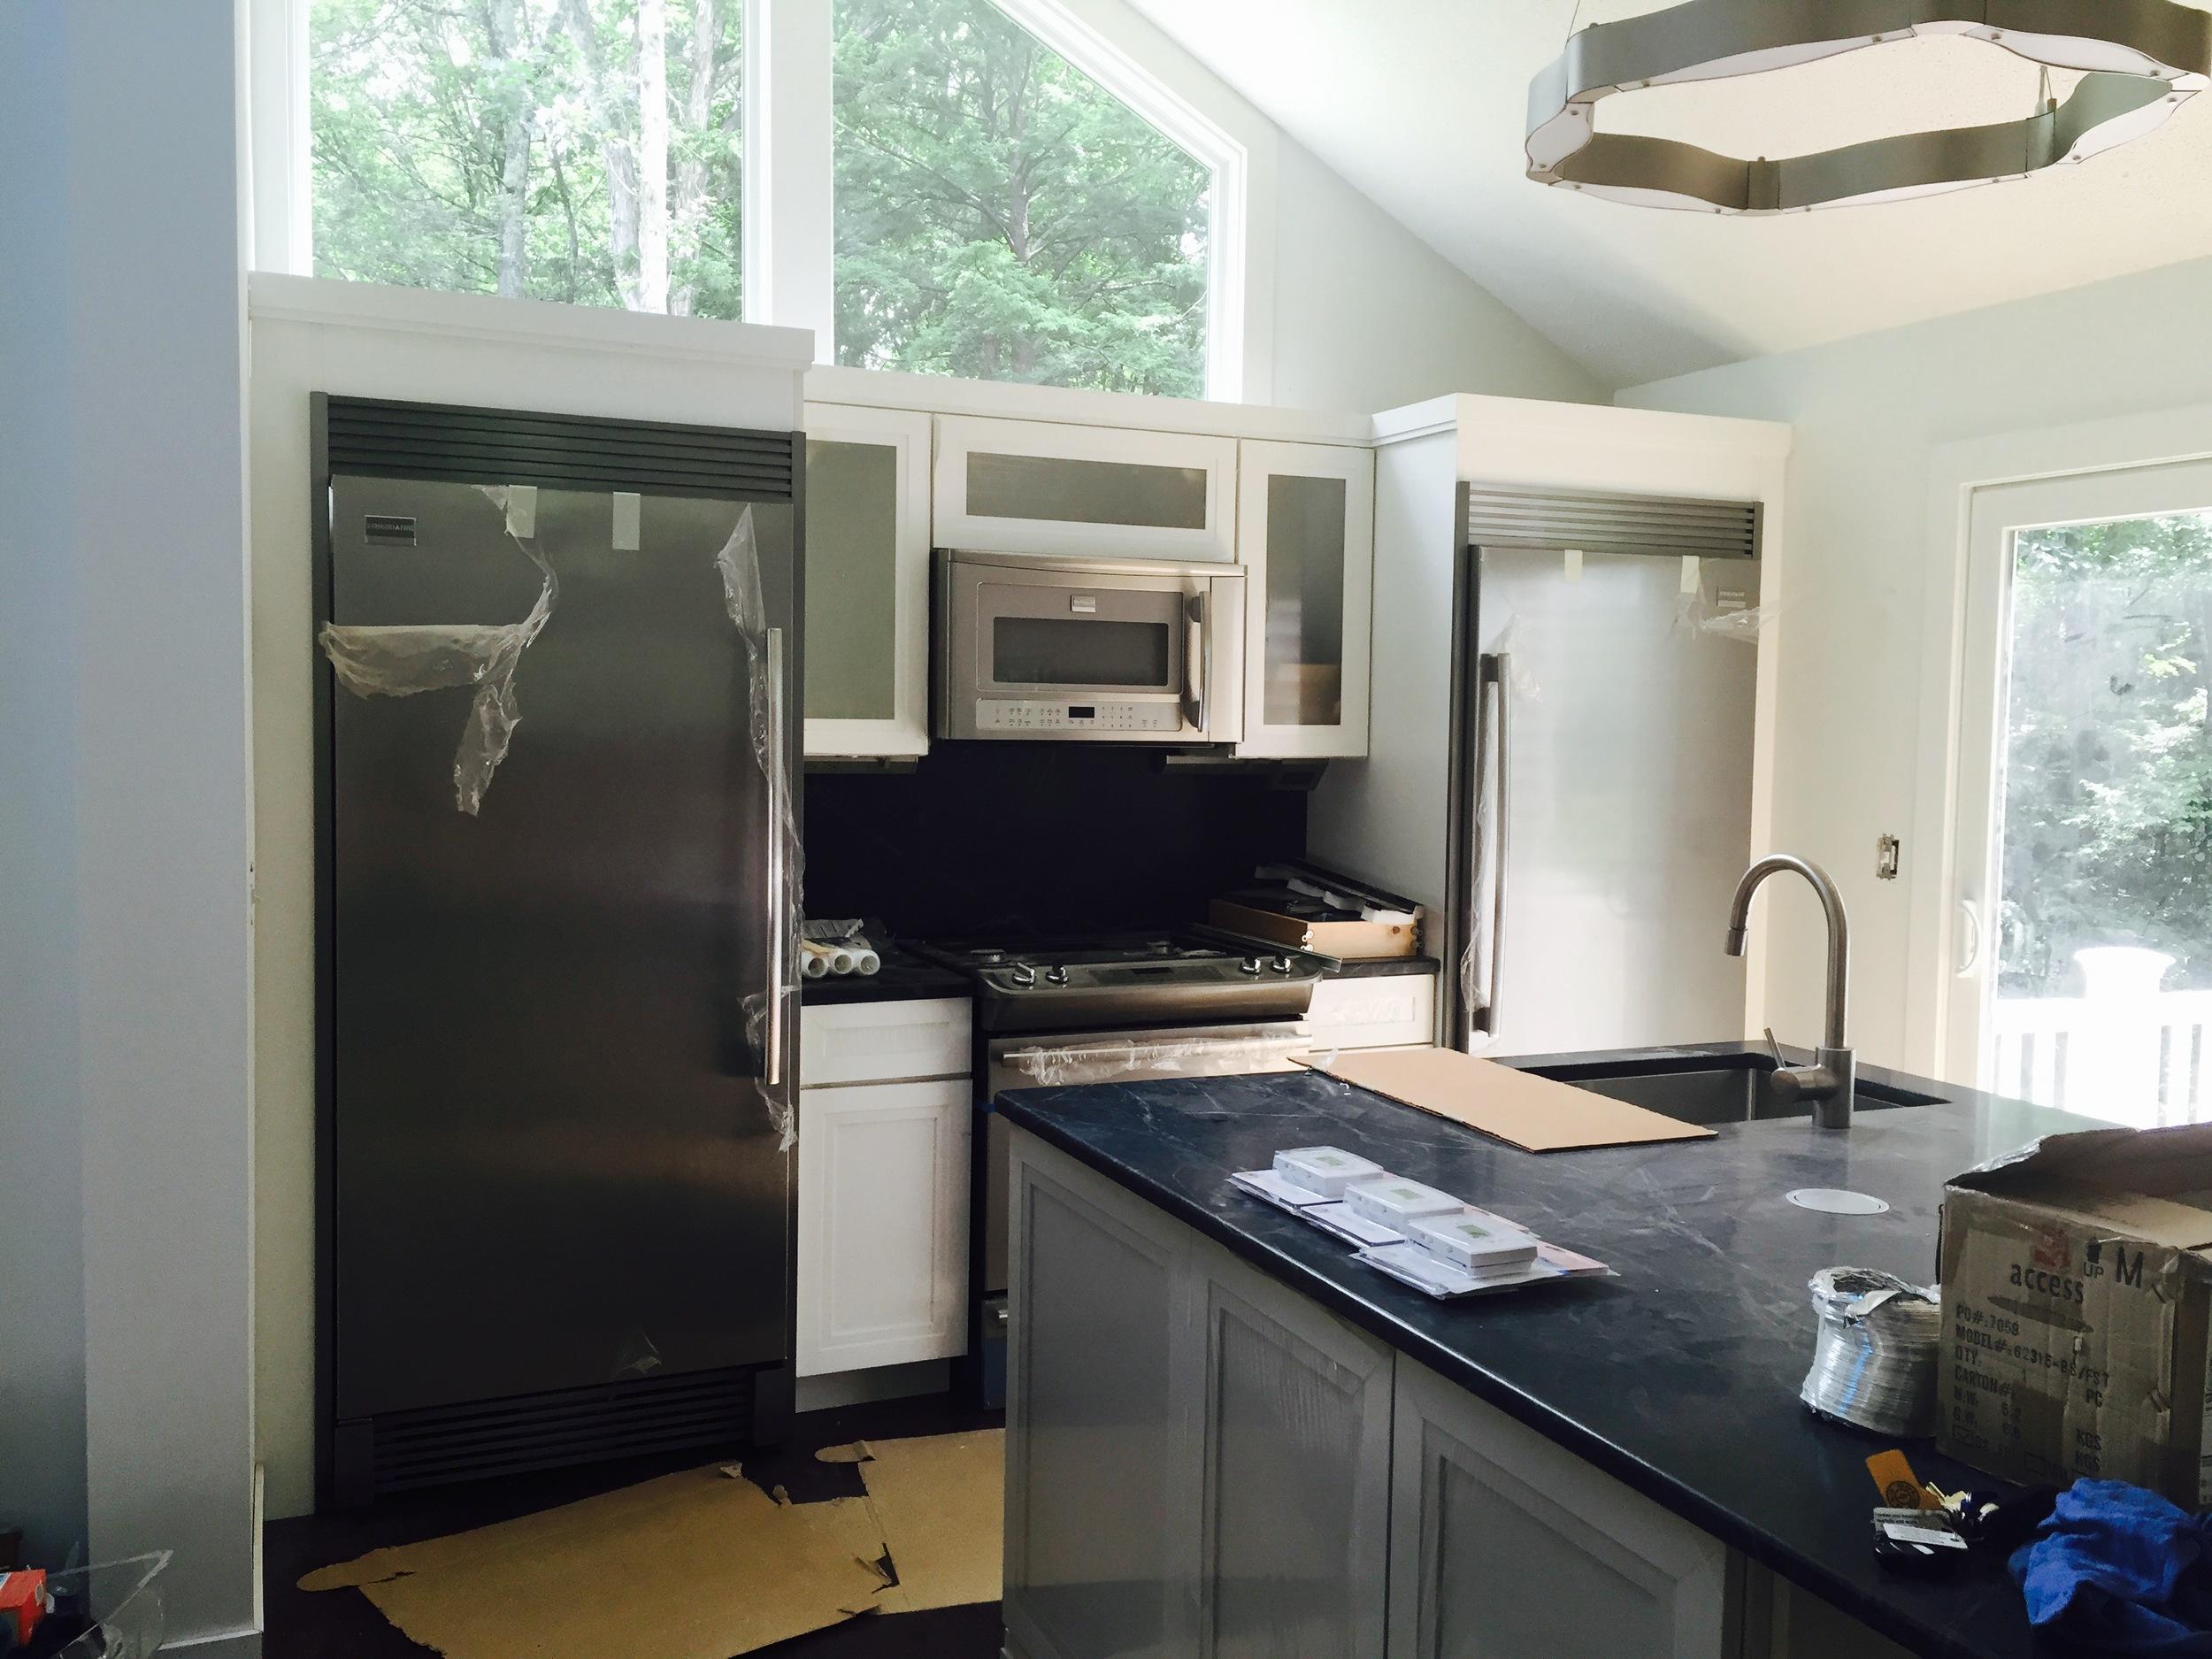 NH Kitchen Install.JPG